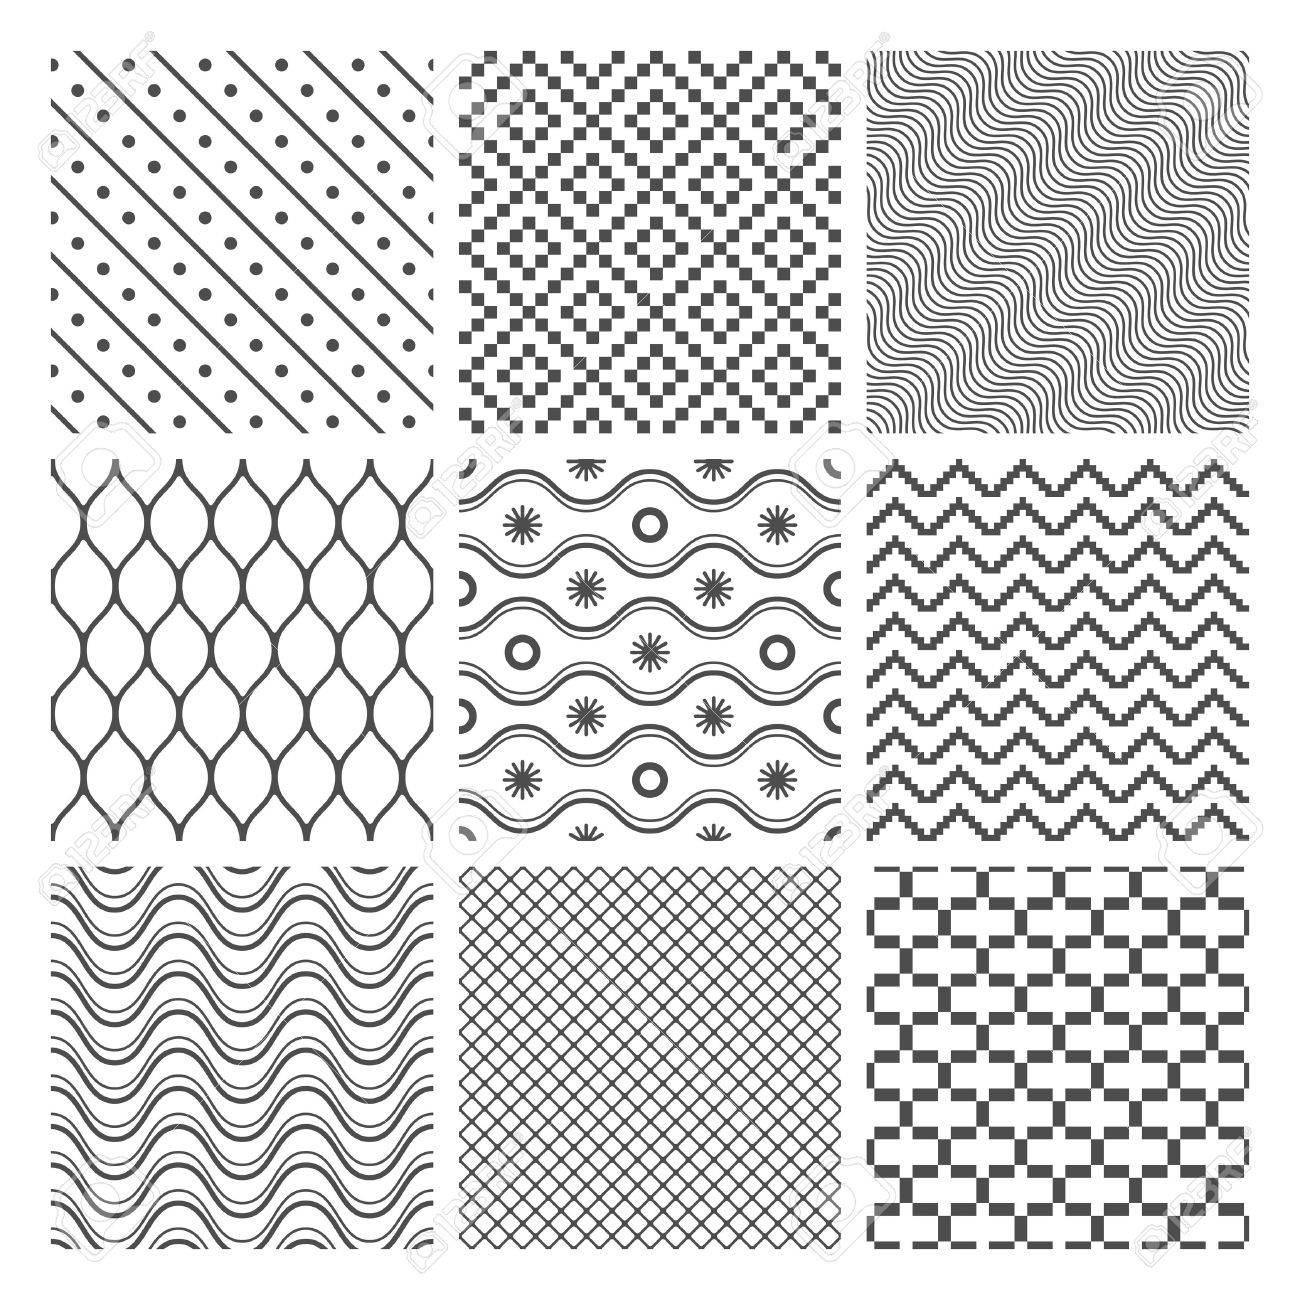 Geometric Seamless Patterns Set  Monochrome Textures on white Stock Vector - 18239887